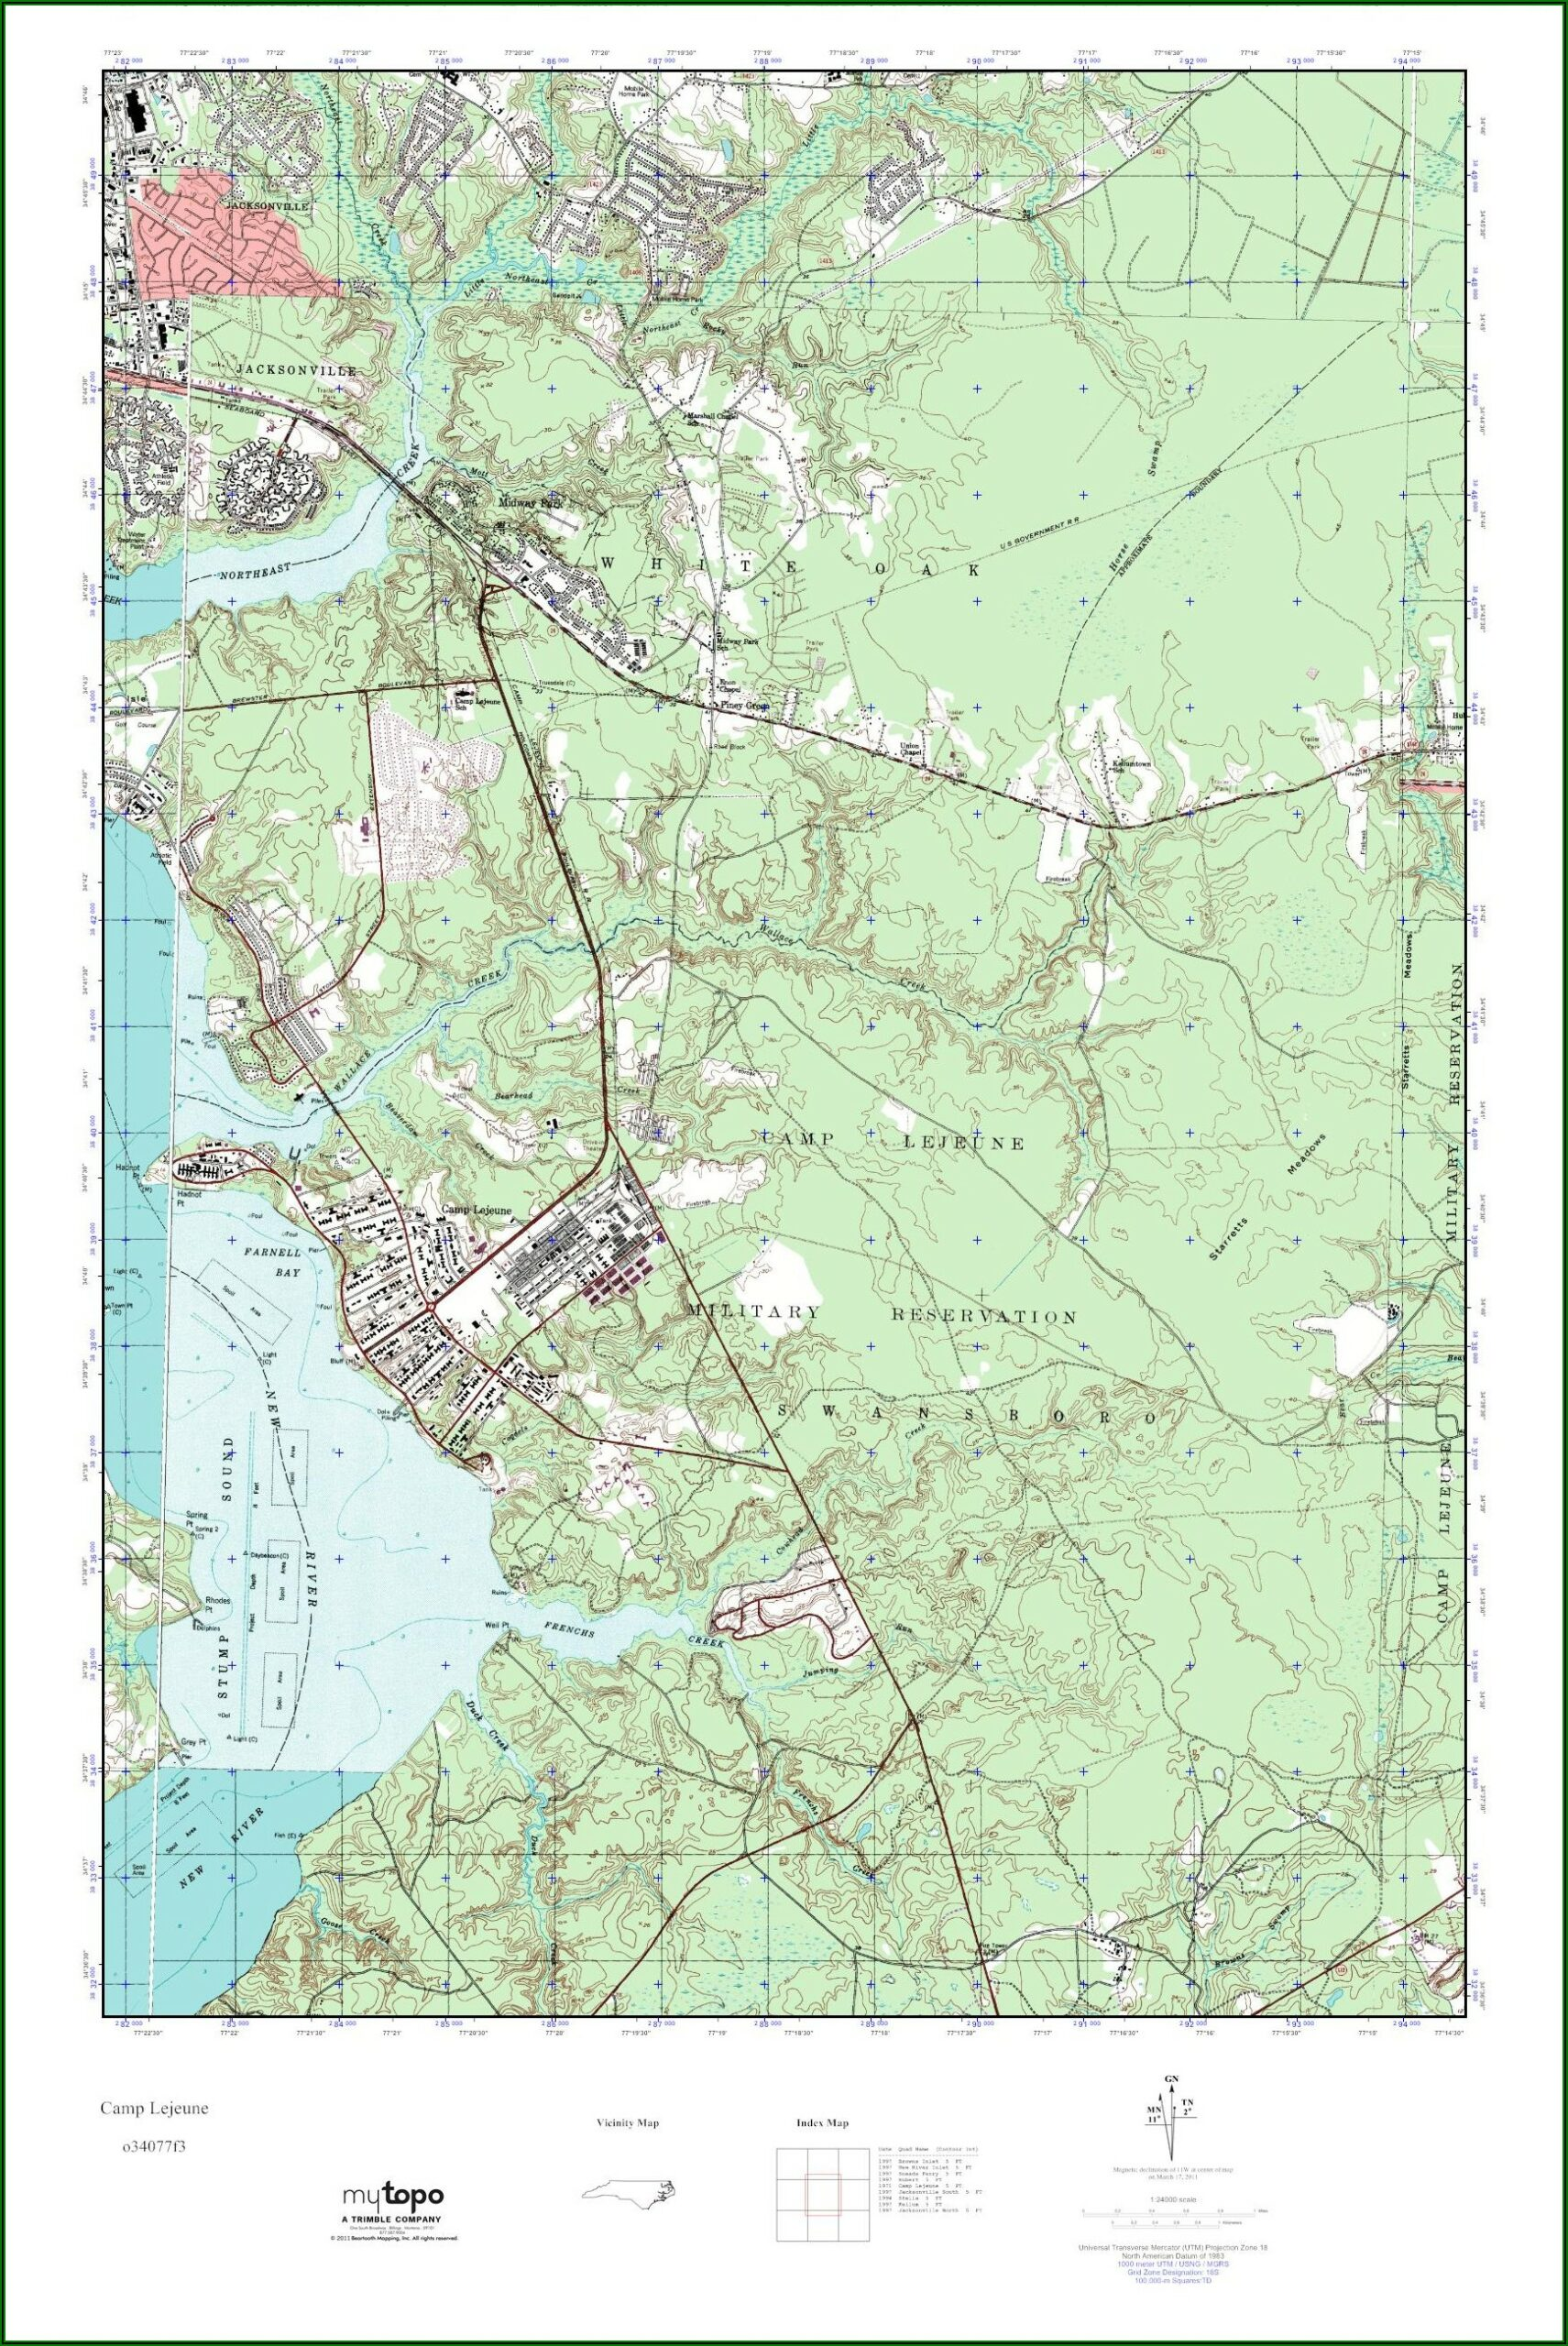 Camp Lejeune Base Map Pdf